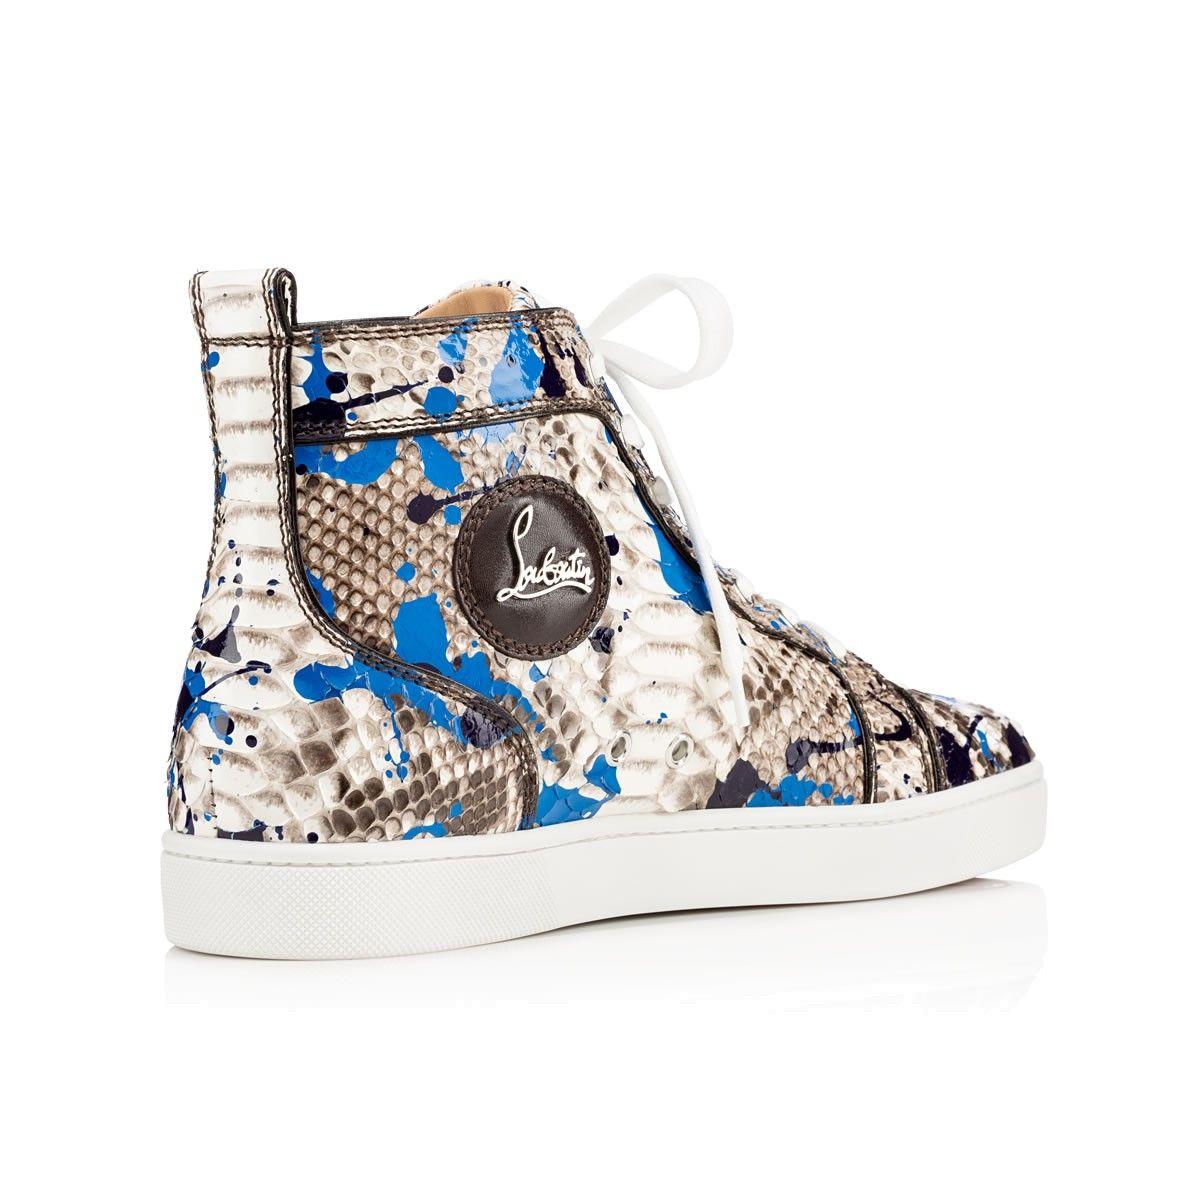 christian louboutin blue python sneakers